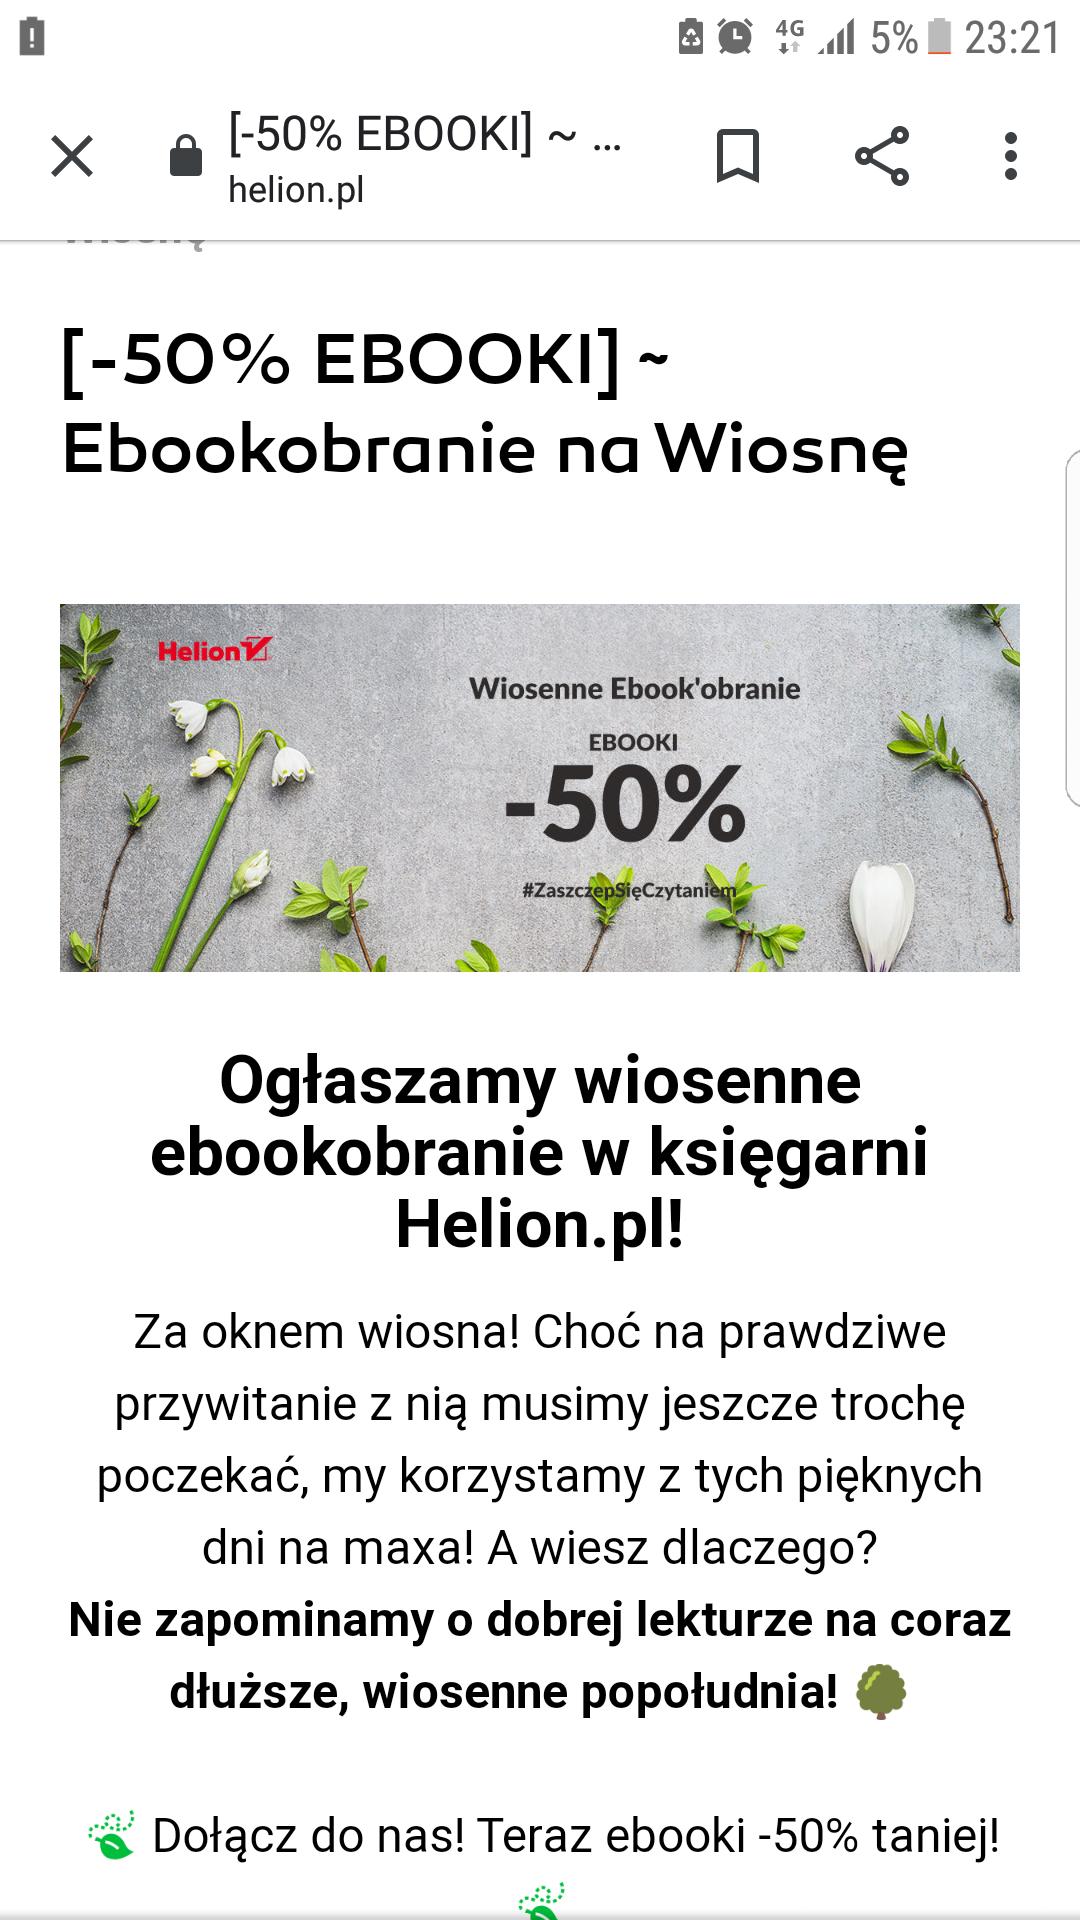 Helion -50% ebooki